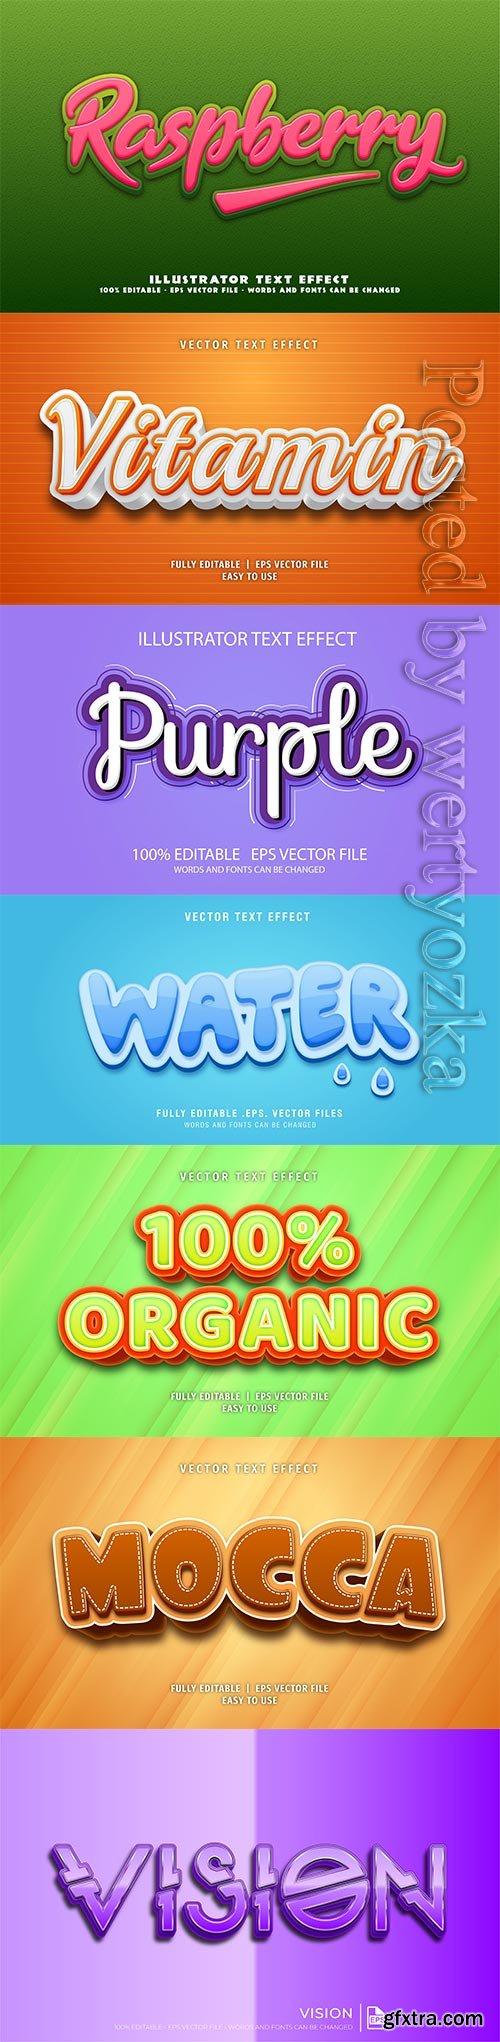 3d editable text style effect vector vol 265